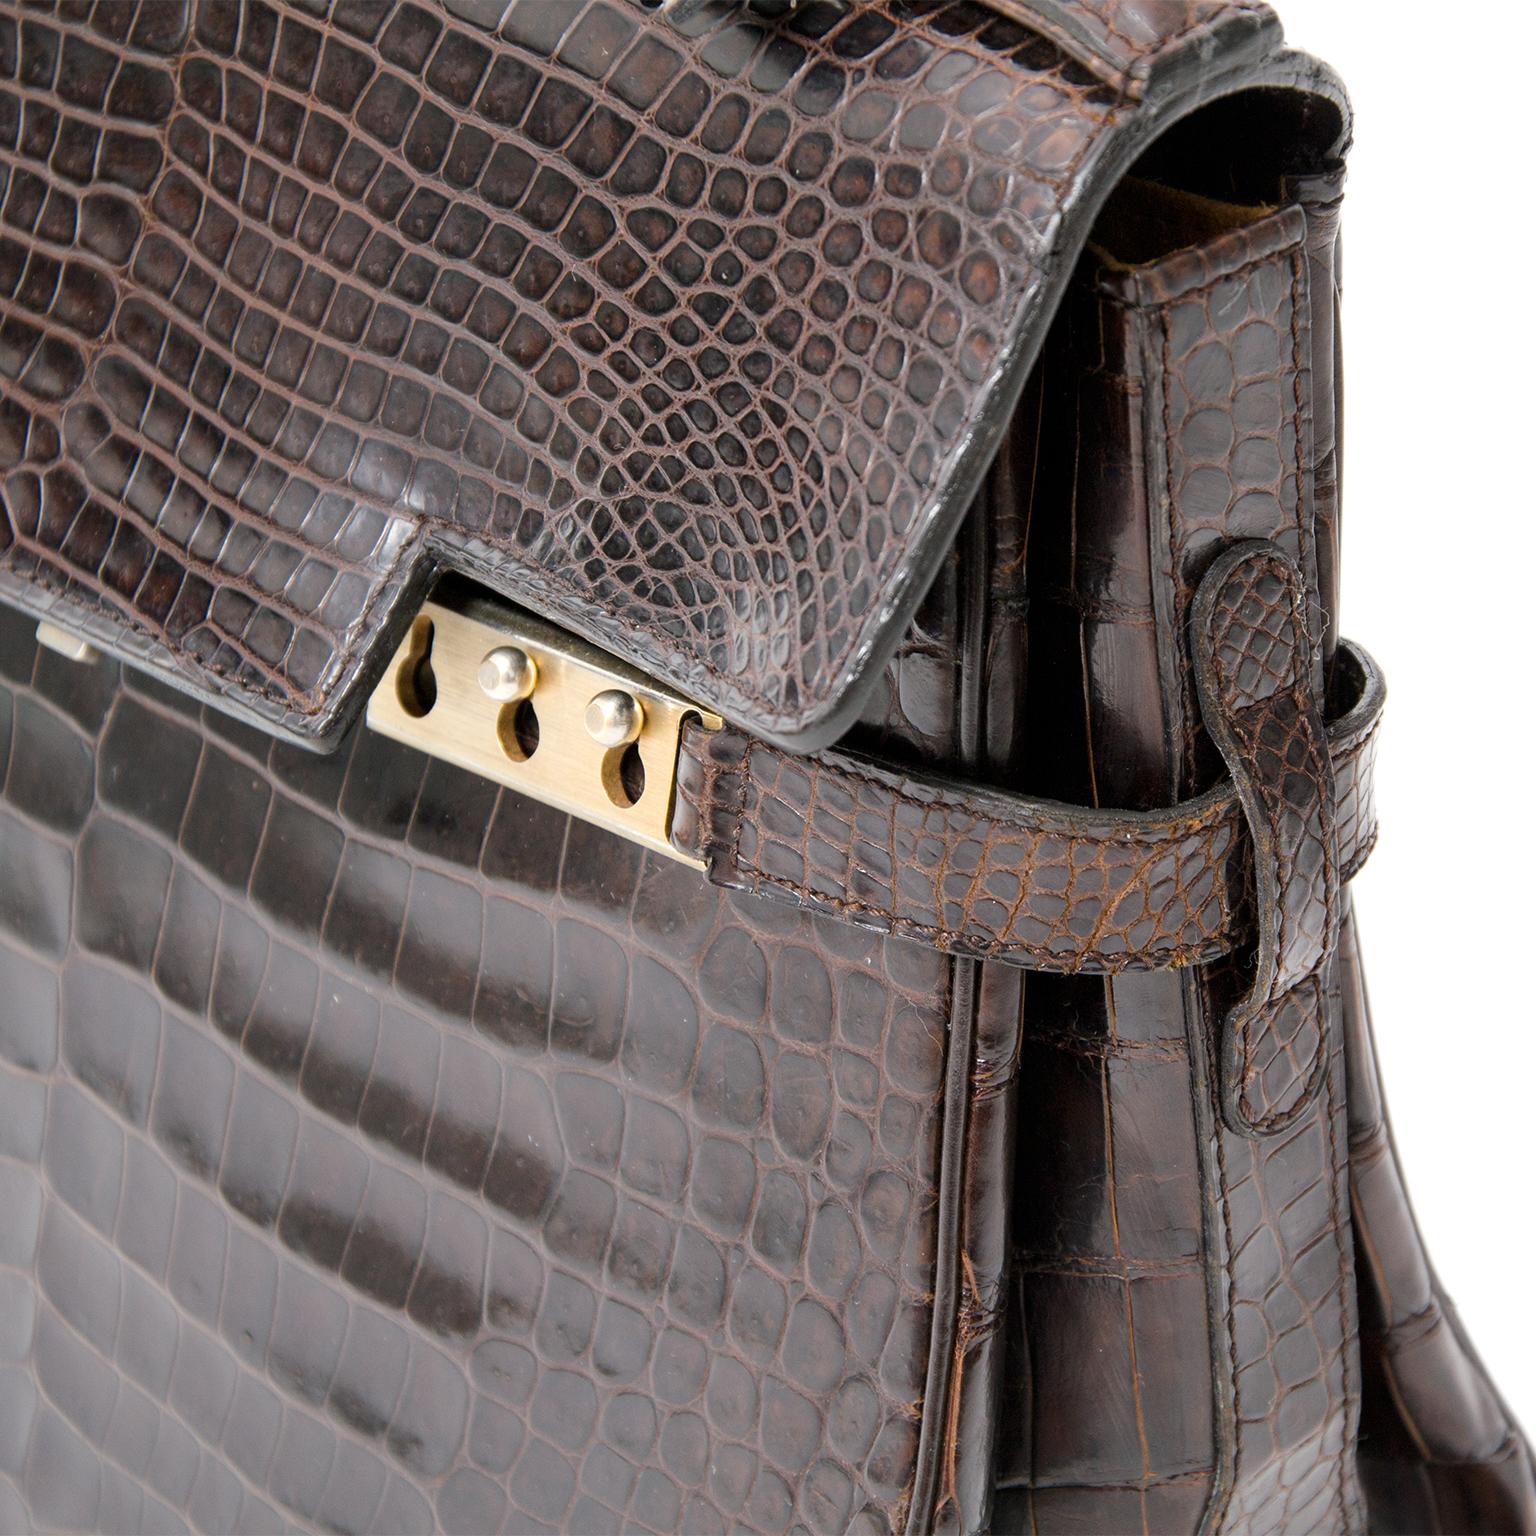 e6cd831b57270 ... shop safe online second hand designer vintage Delvaux tempete croco aan  de beste prijs online webshop